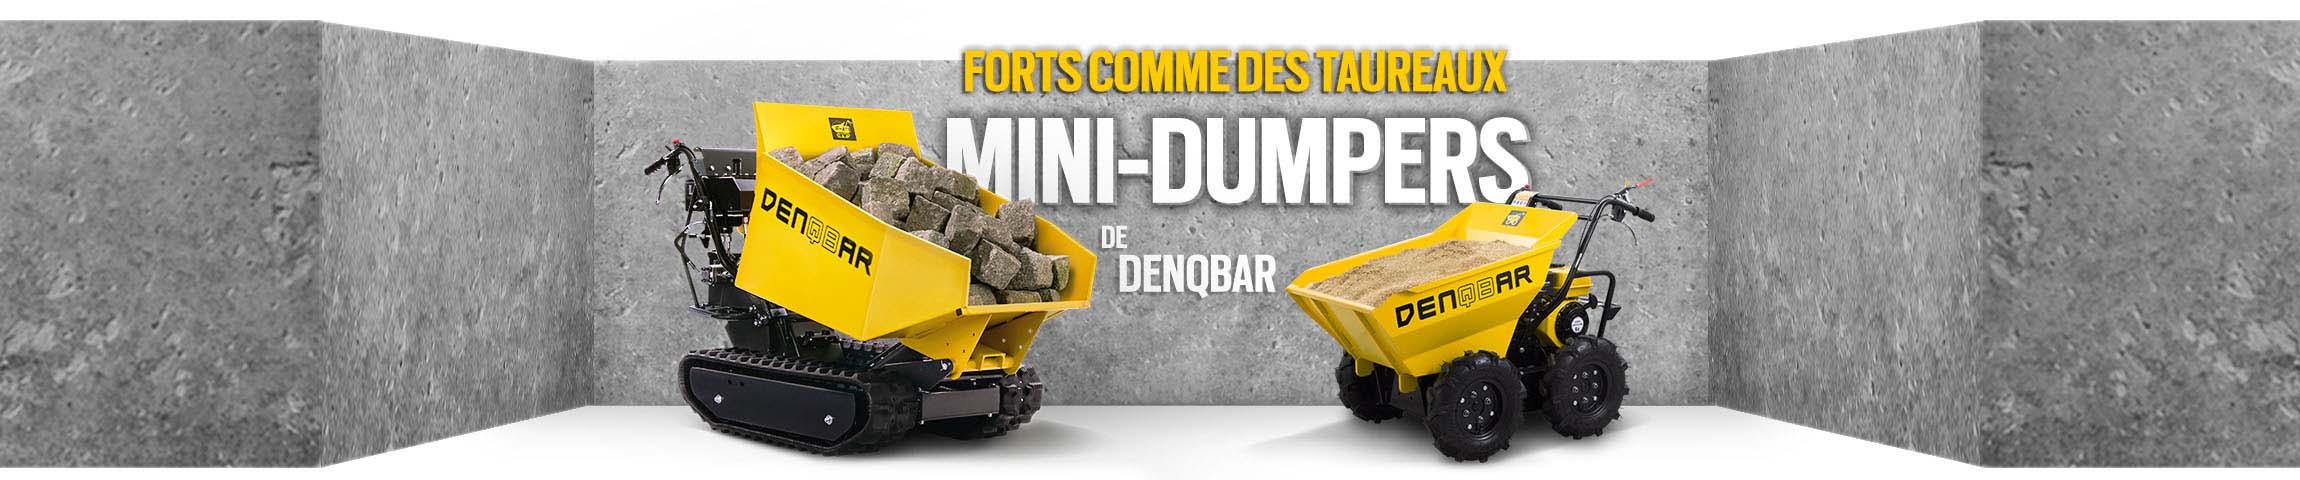 "Mini Dumper"""